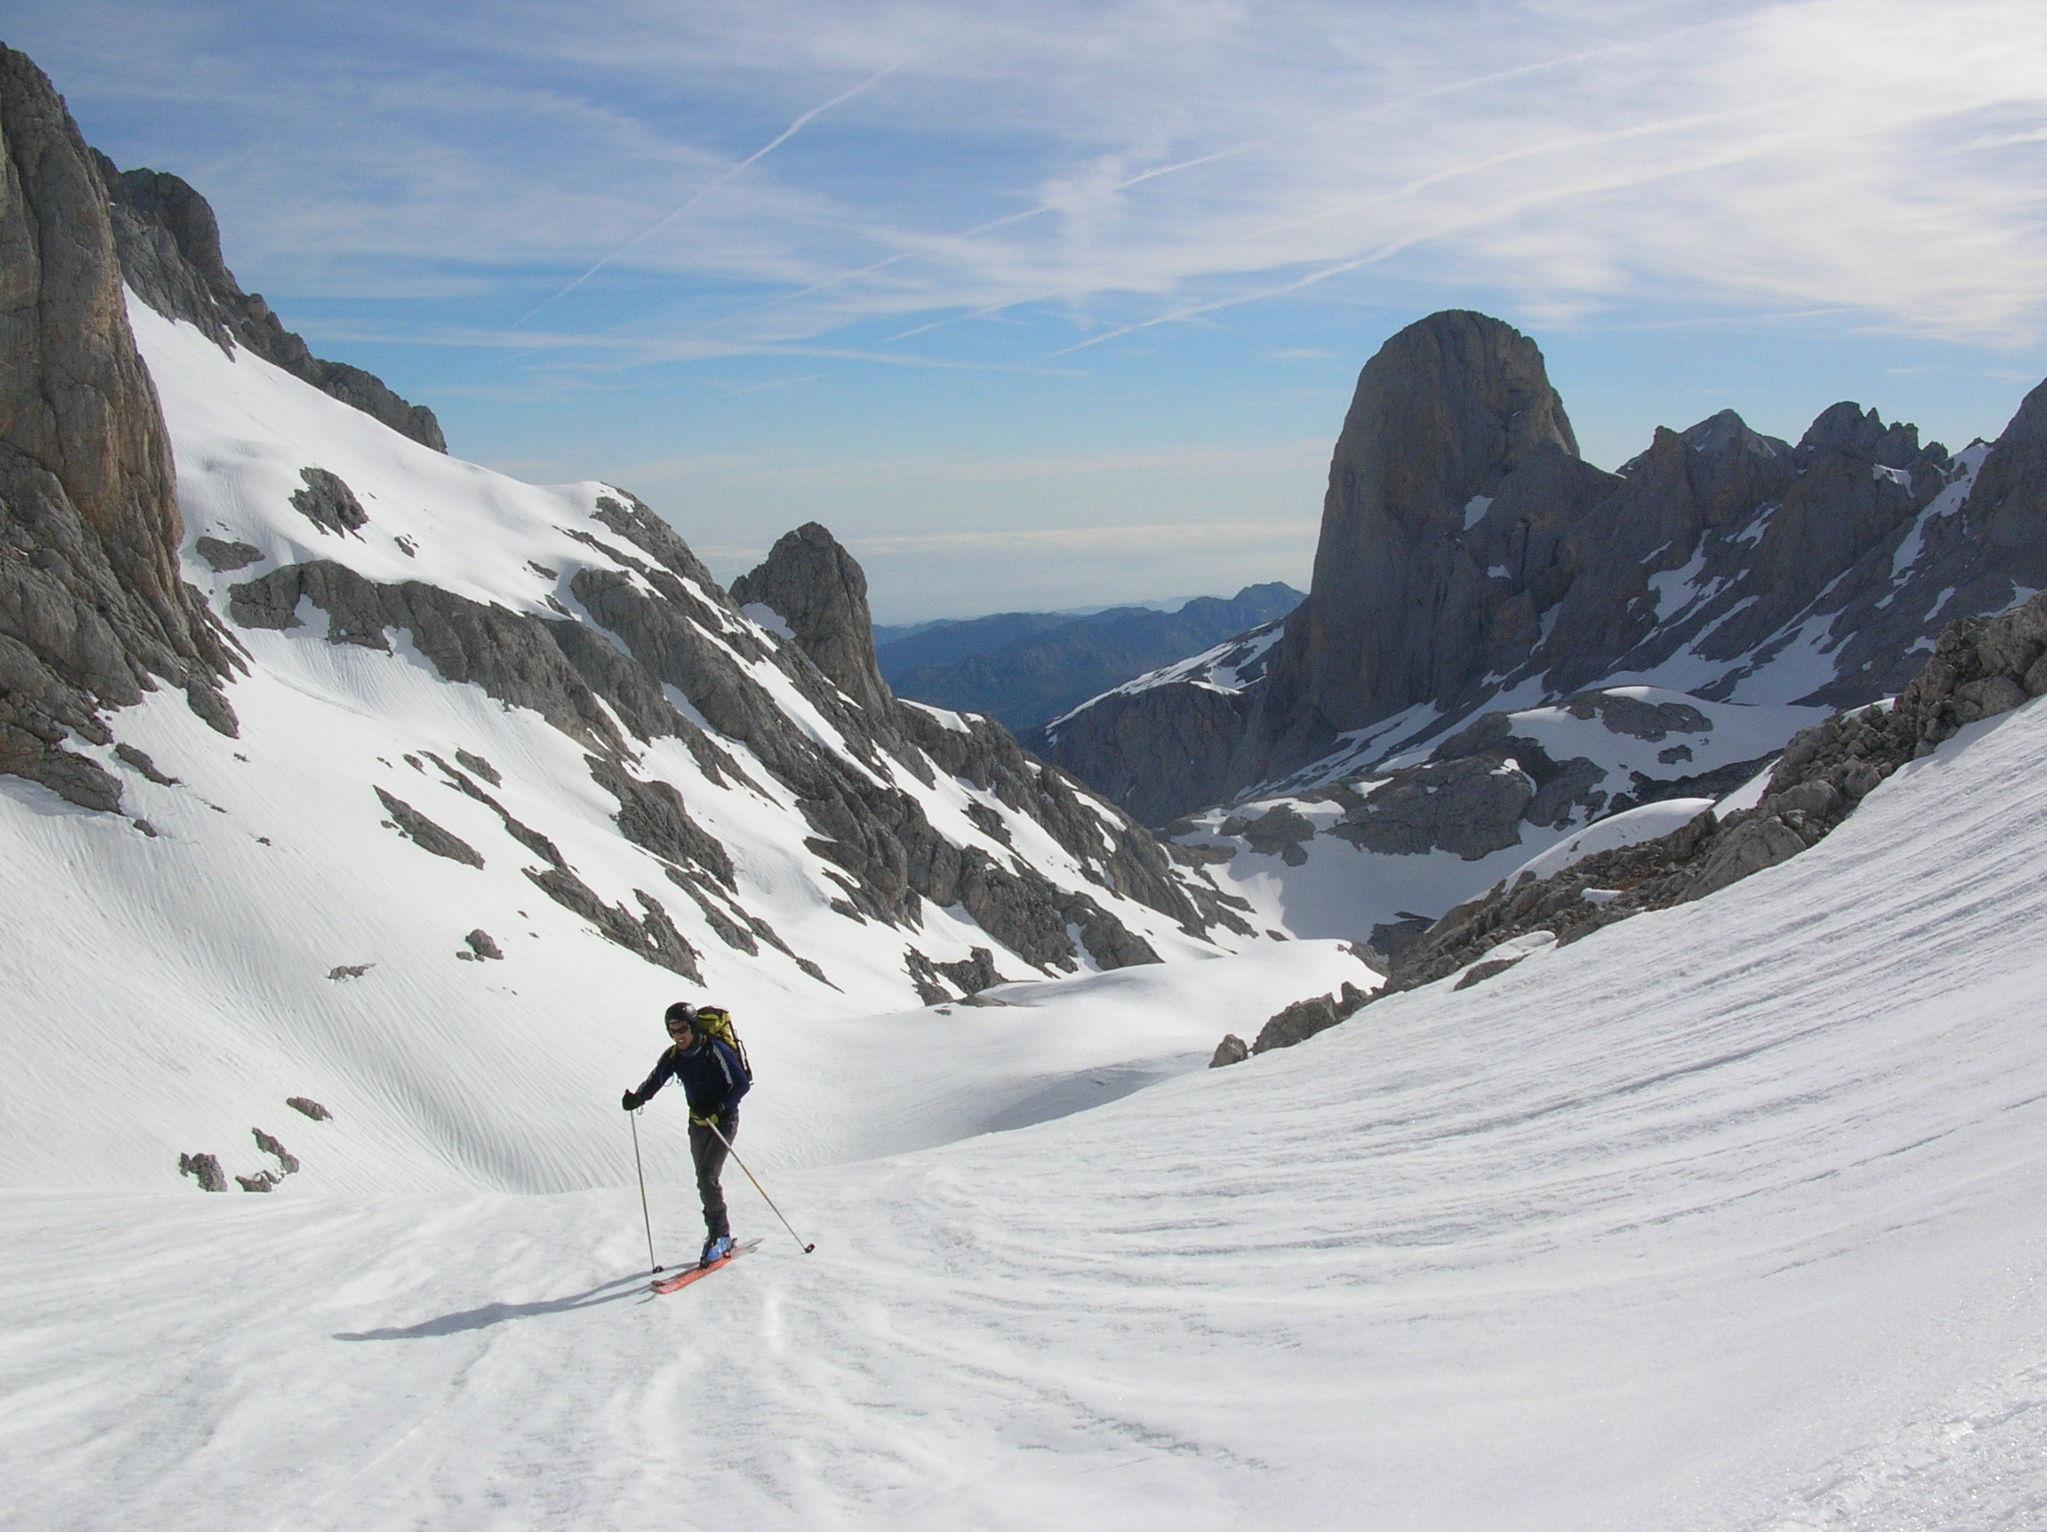 Urriellu-Picos de Europa - photo taken by Rafael  Belderrain